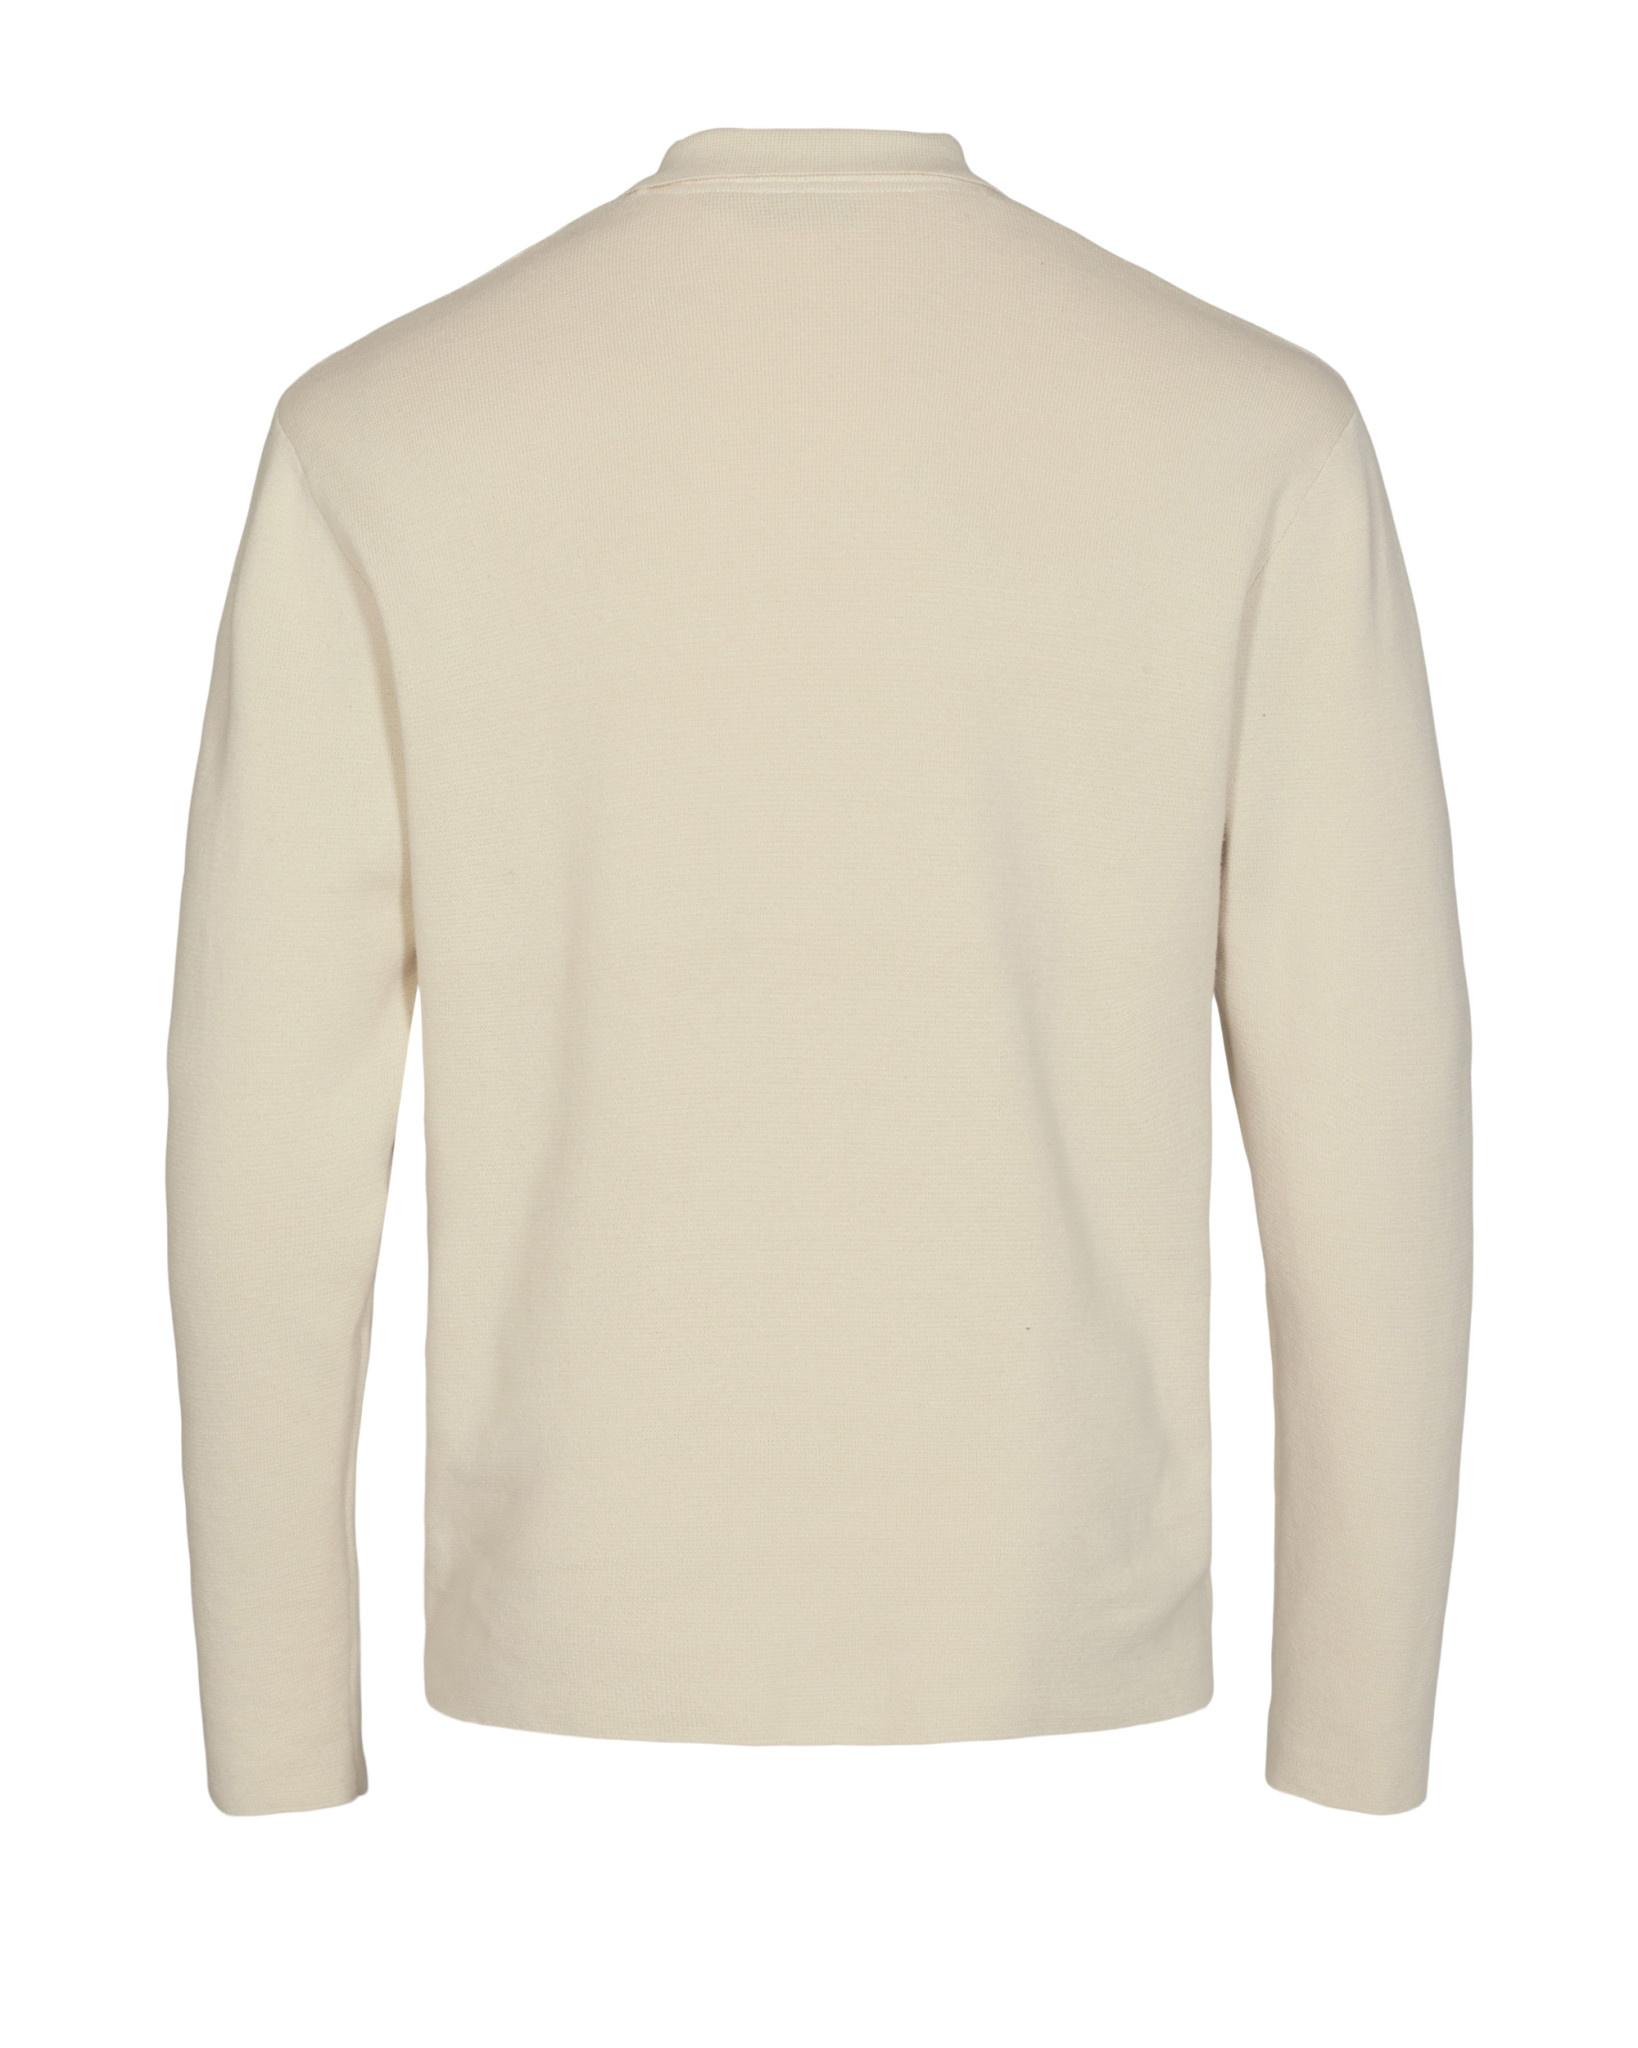 Minimum Minimum Hoff 9126 Knit Broken White